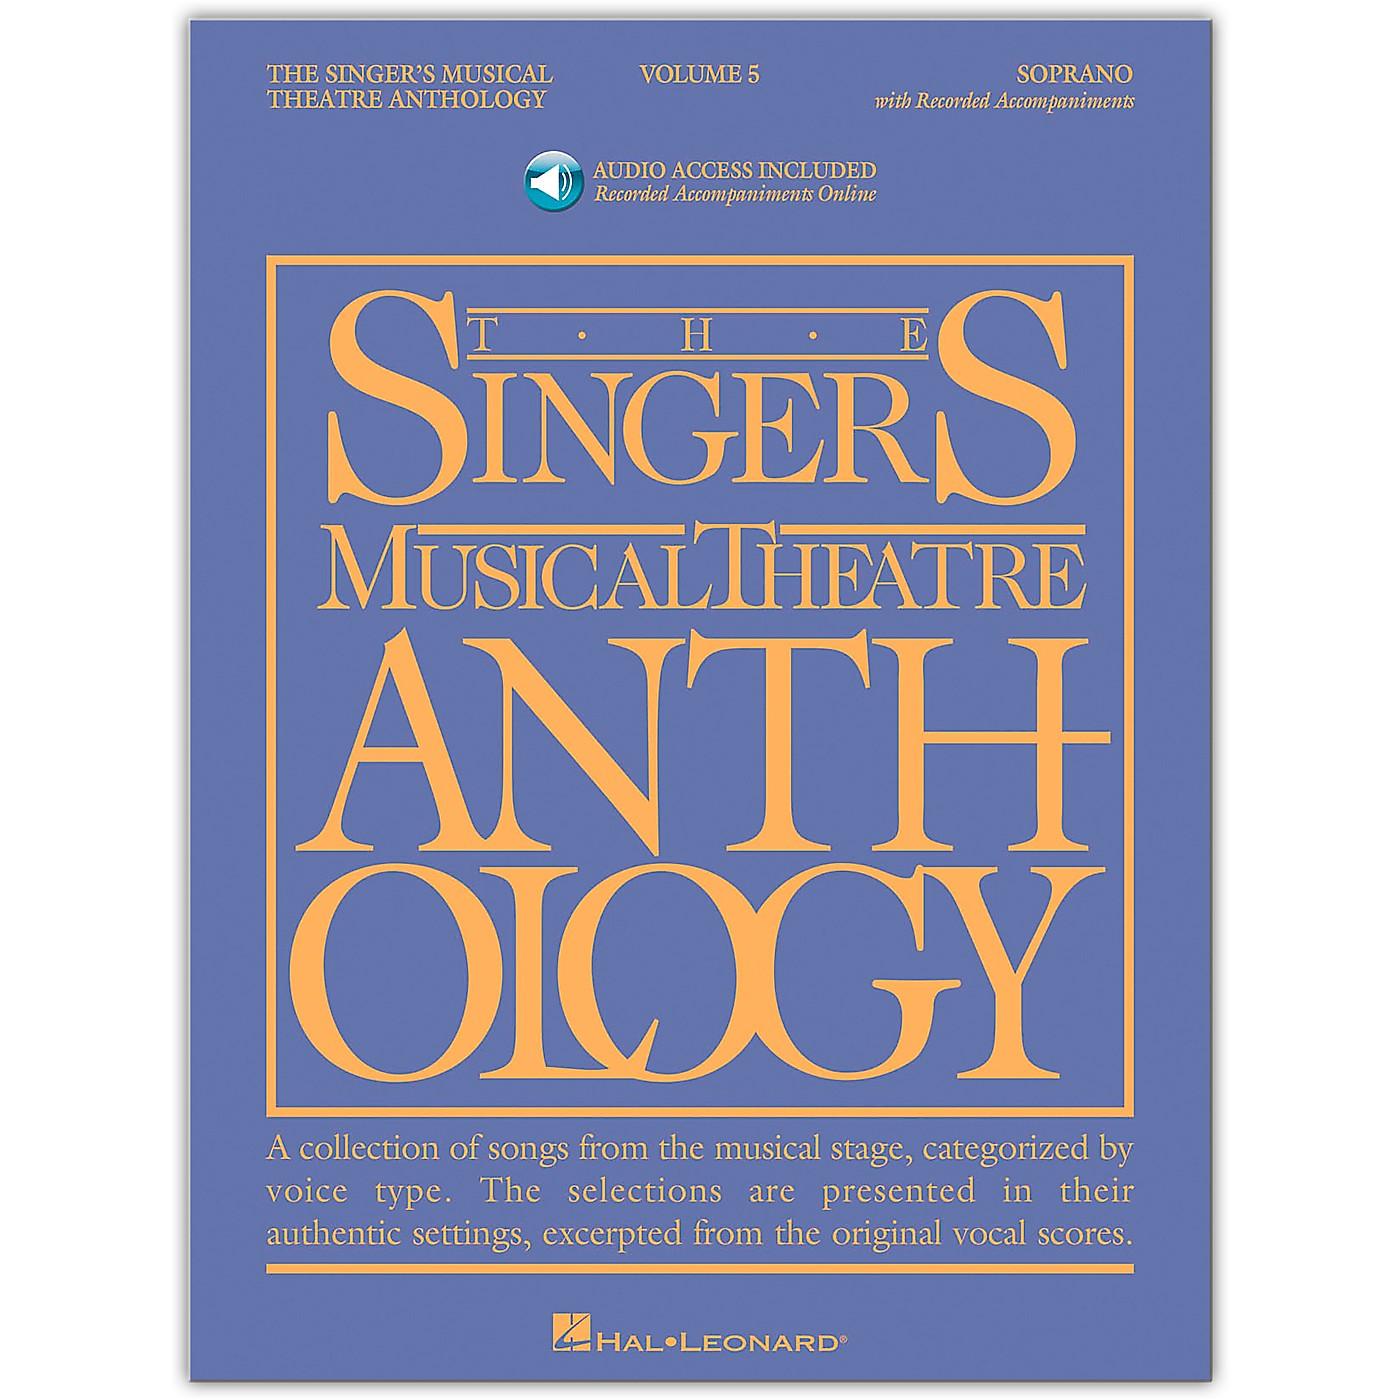 Hal Leonard Singer's Musical Theatre Anthology for Soprano Vol 5 Book/Online Audio thumbnail